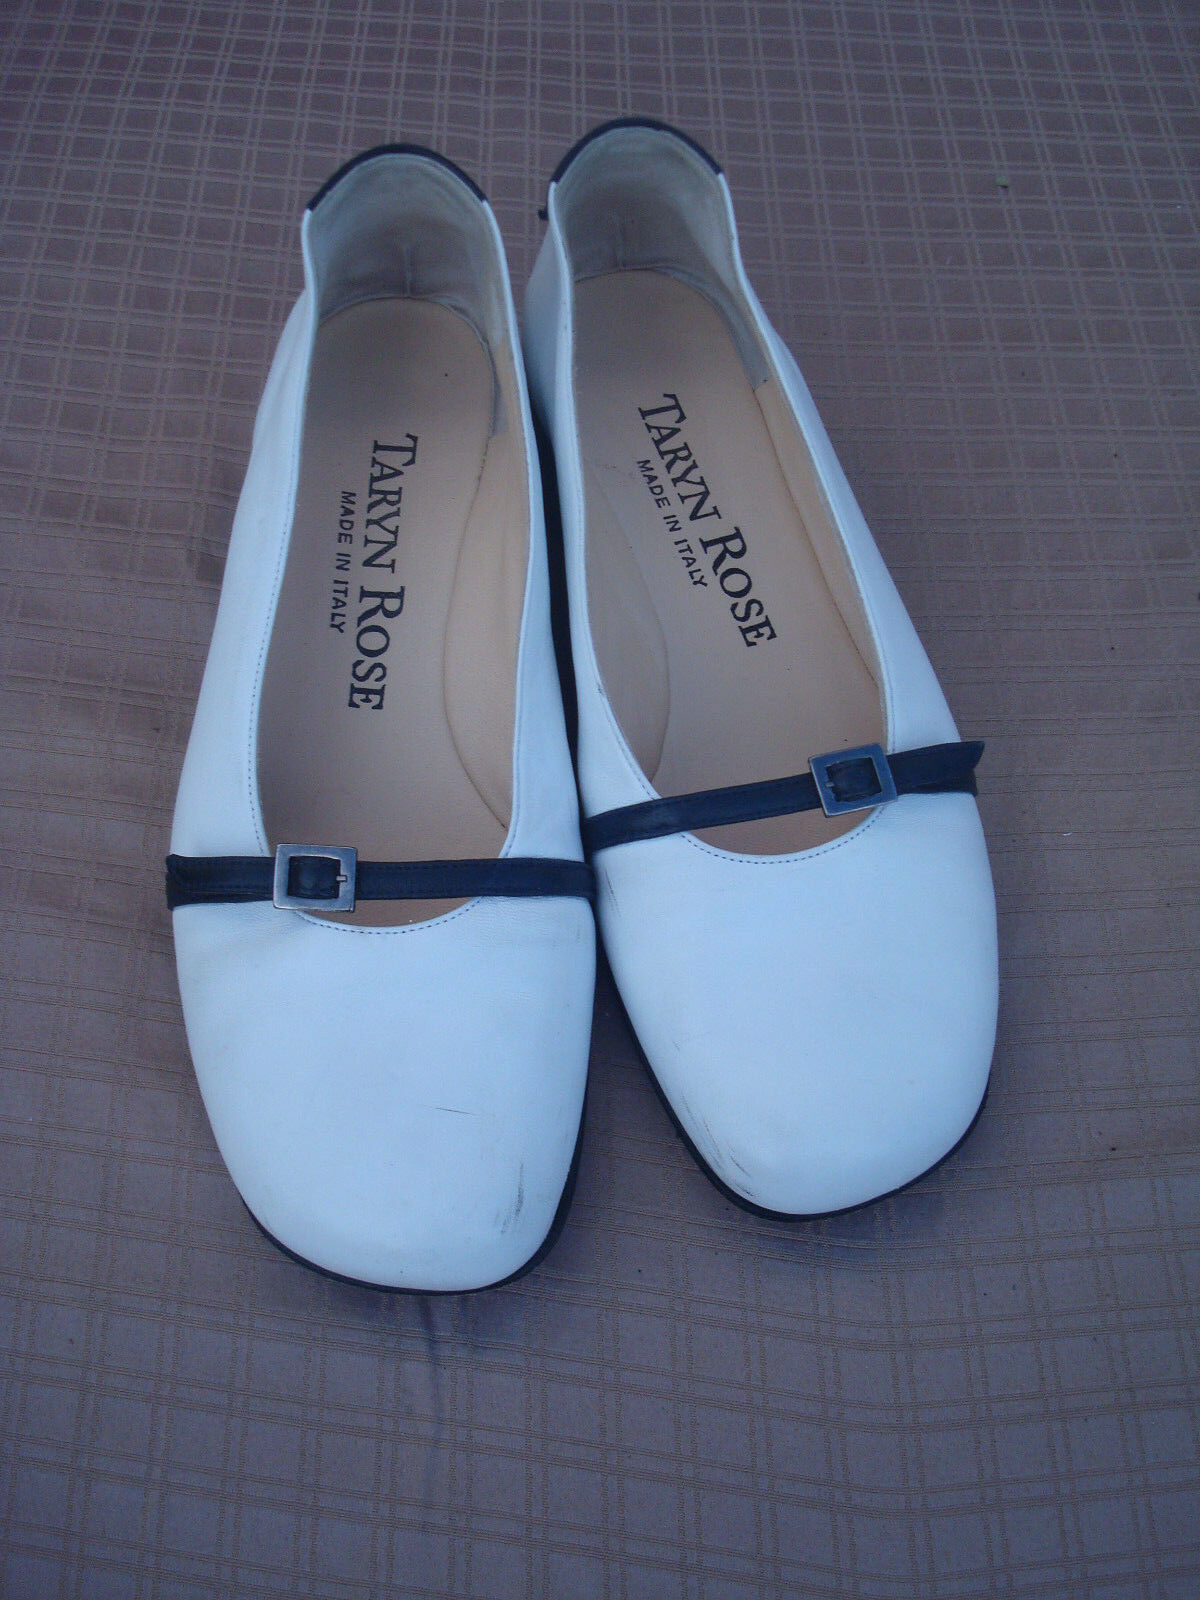 Taryn Rose Comfy White Navy Blue Genuine Pelle Donna Flat Ballet Scarpe 6 Italy